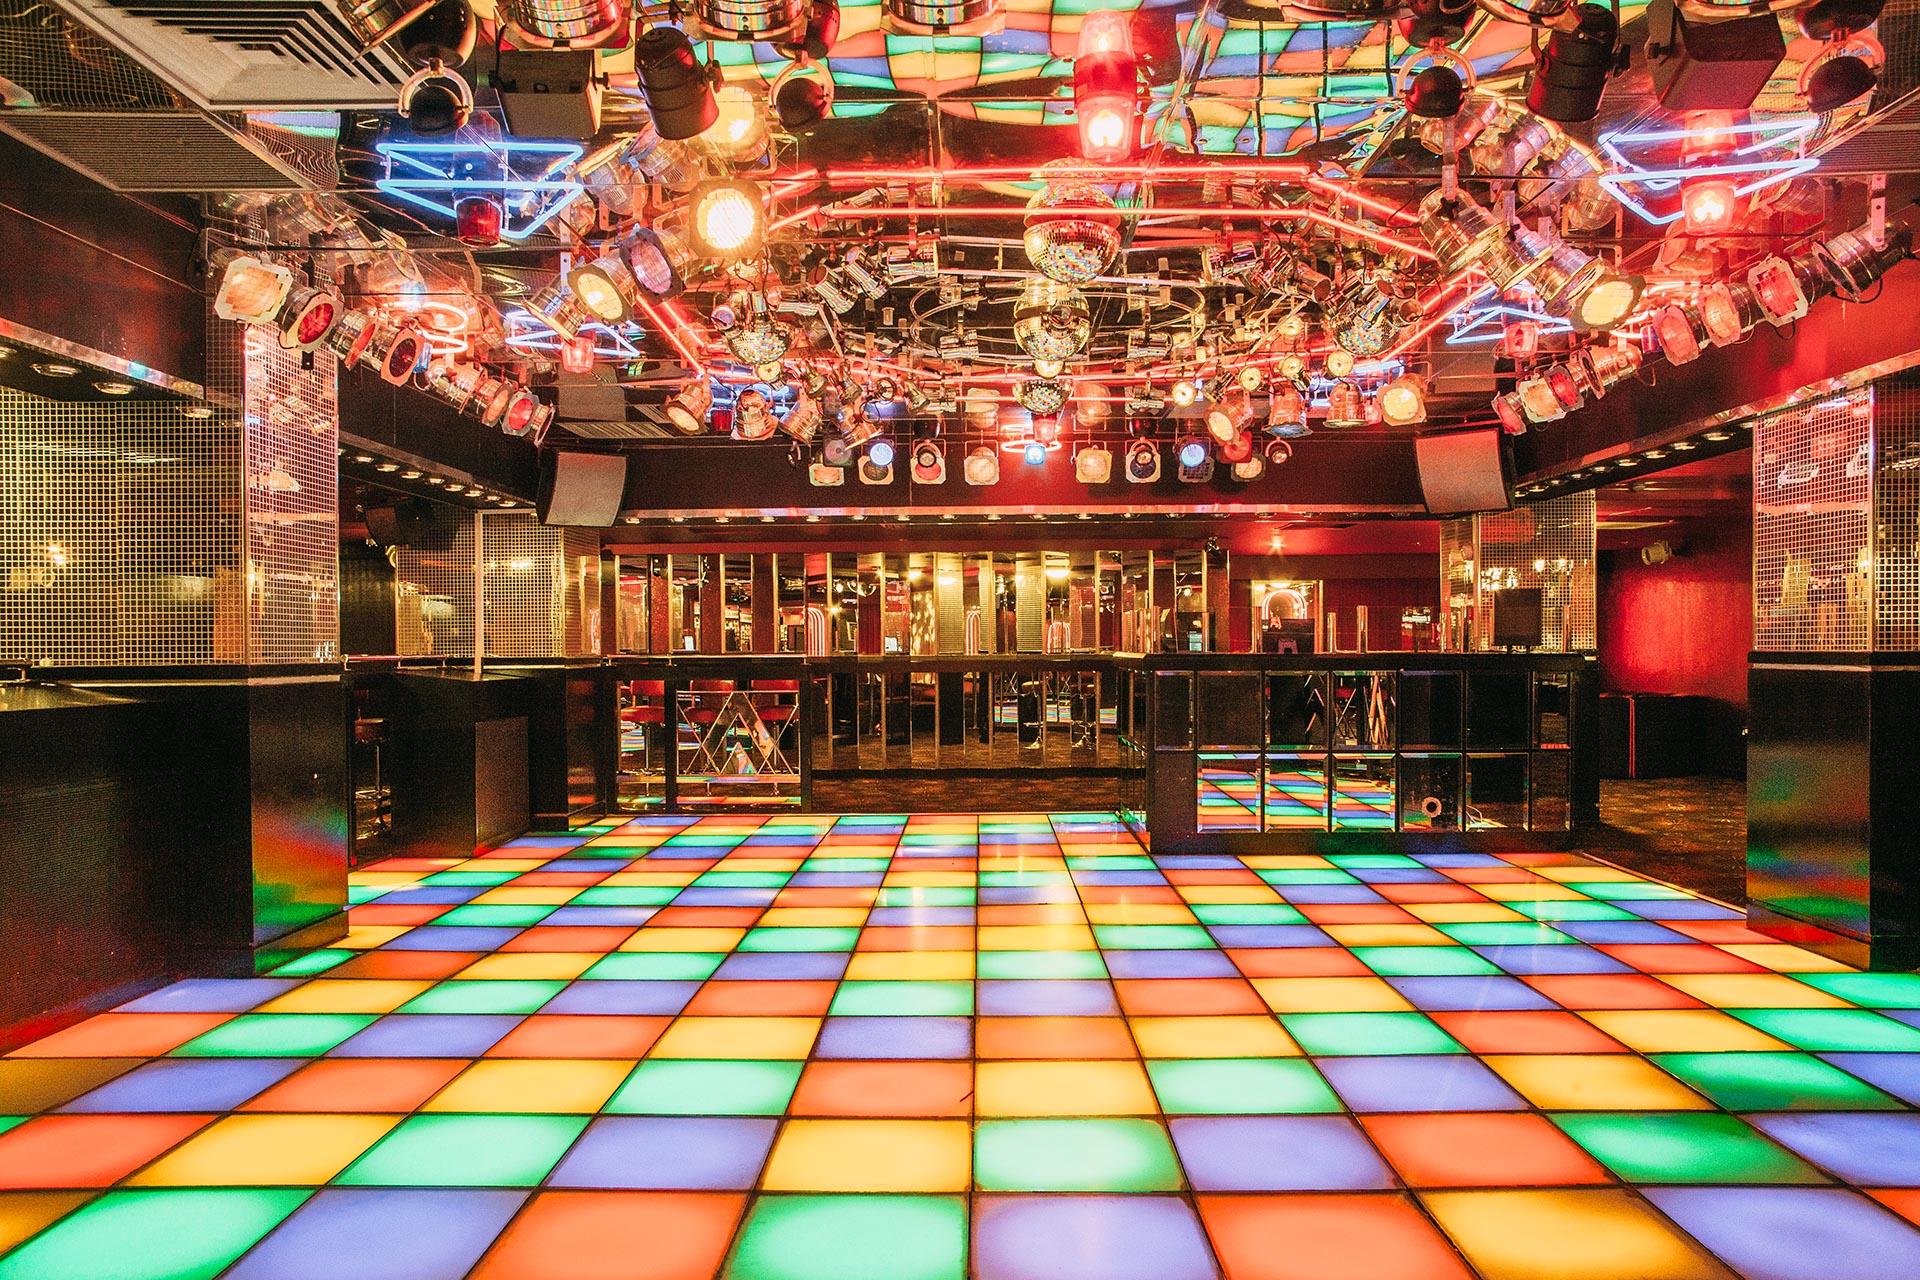 Oceana nightclub brighton